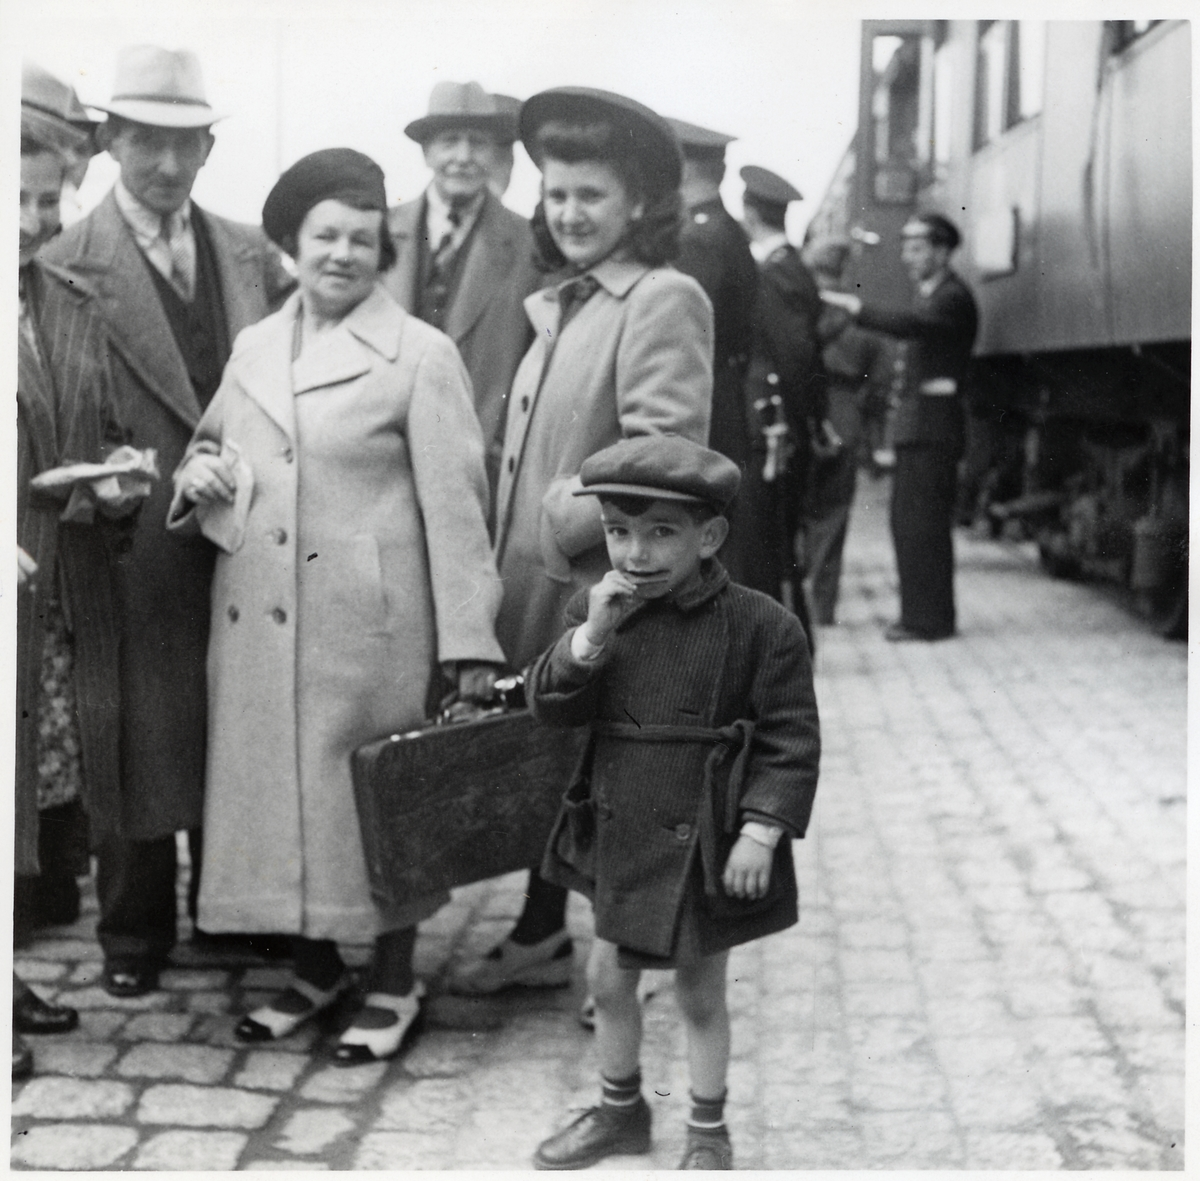 Danska flyktingar på hemresa.